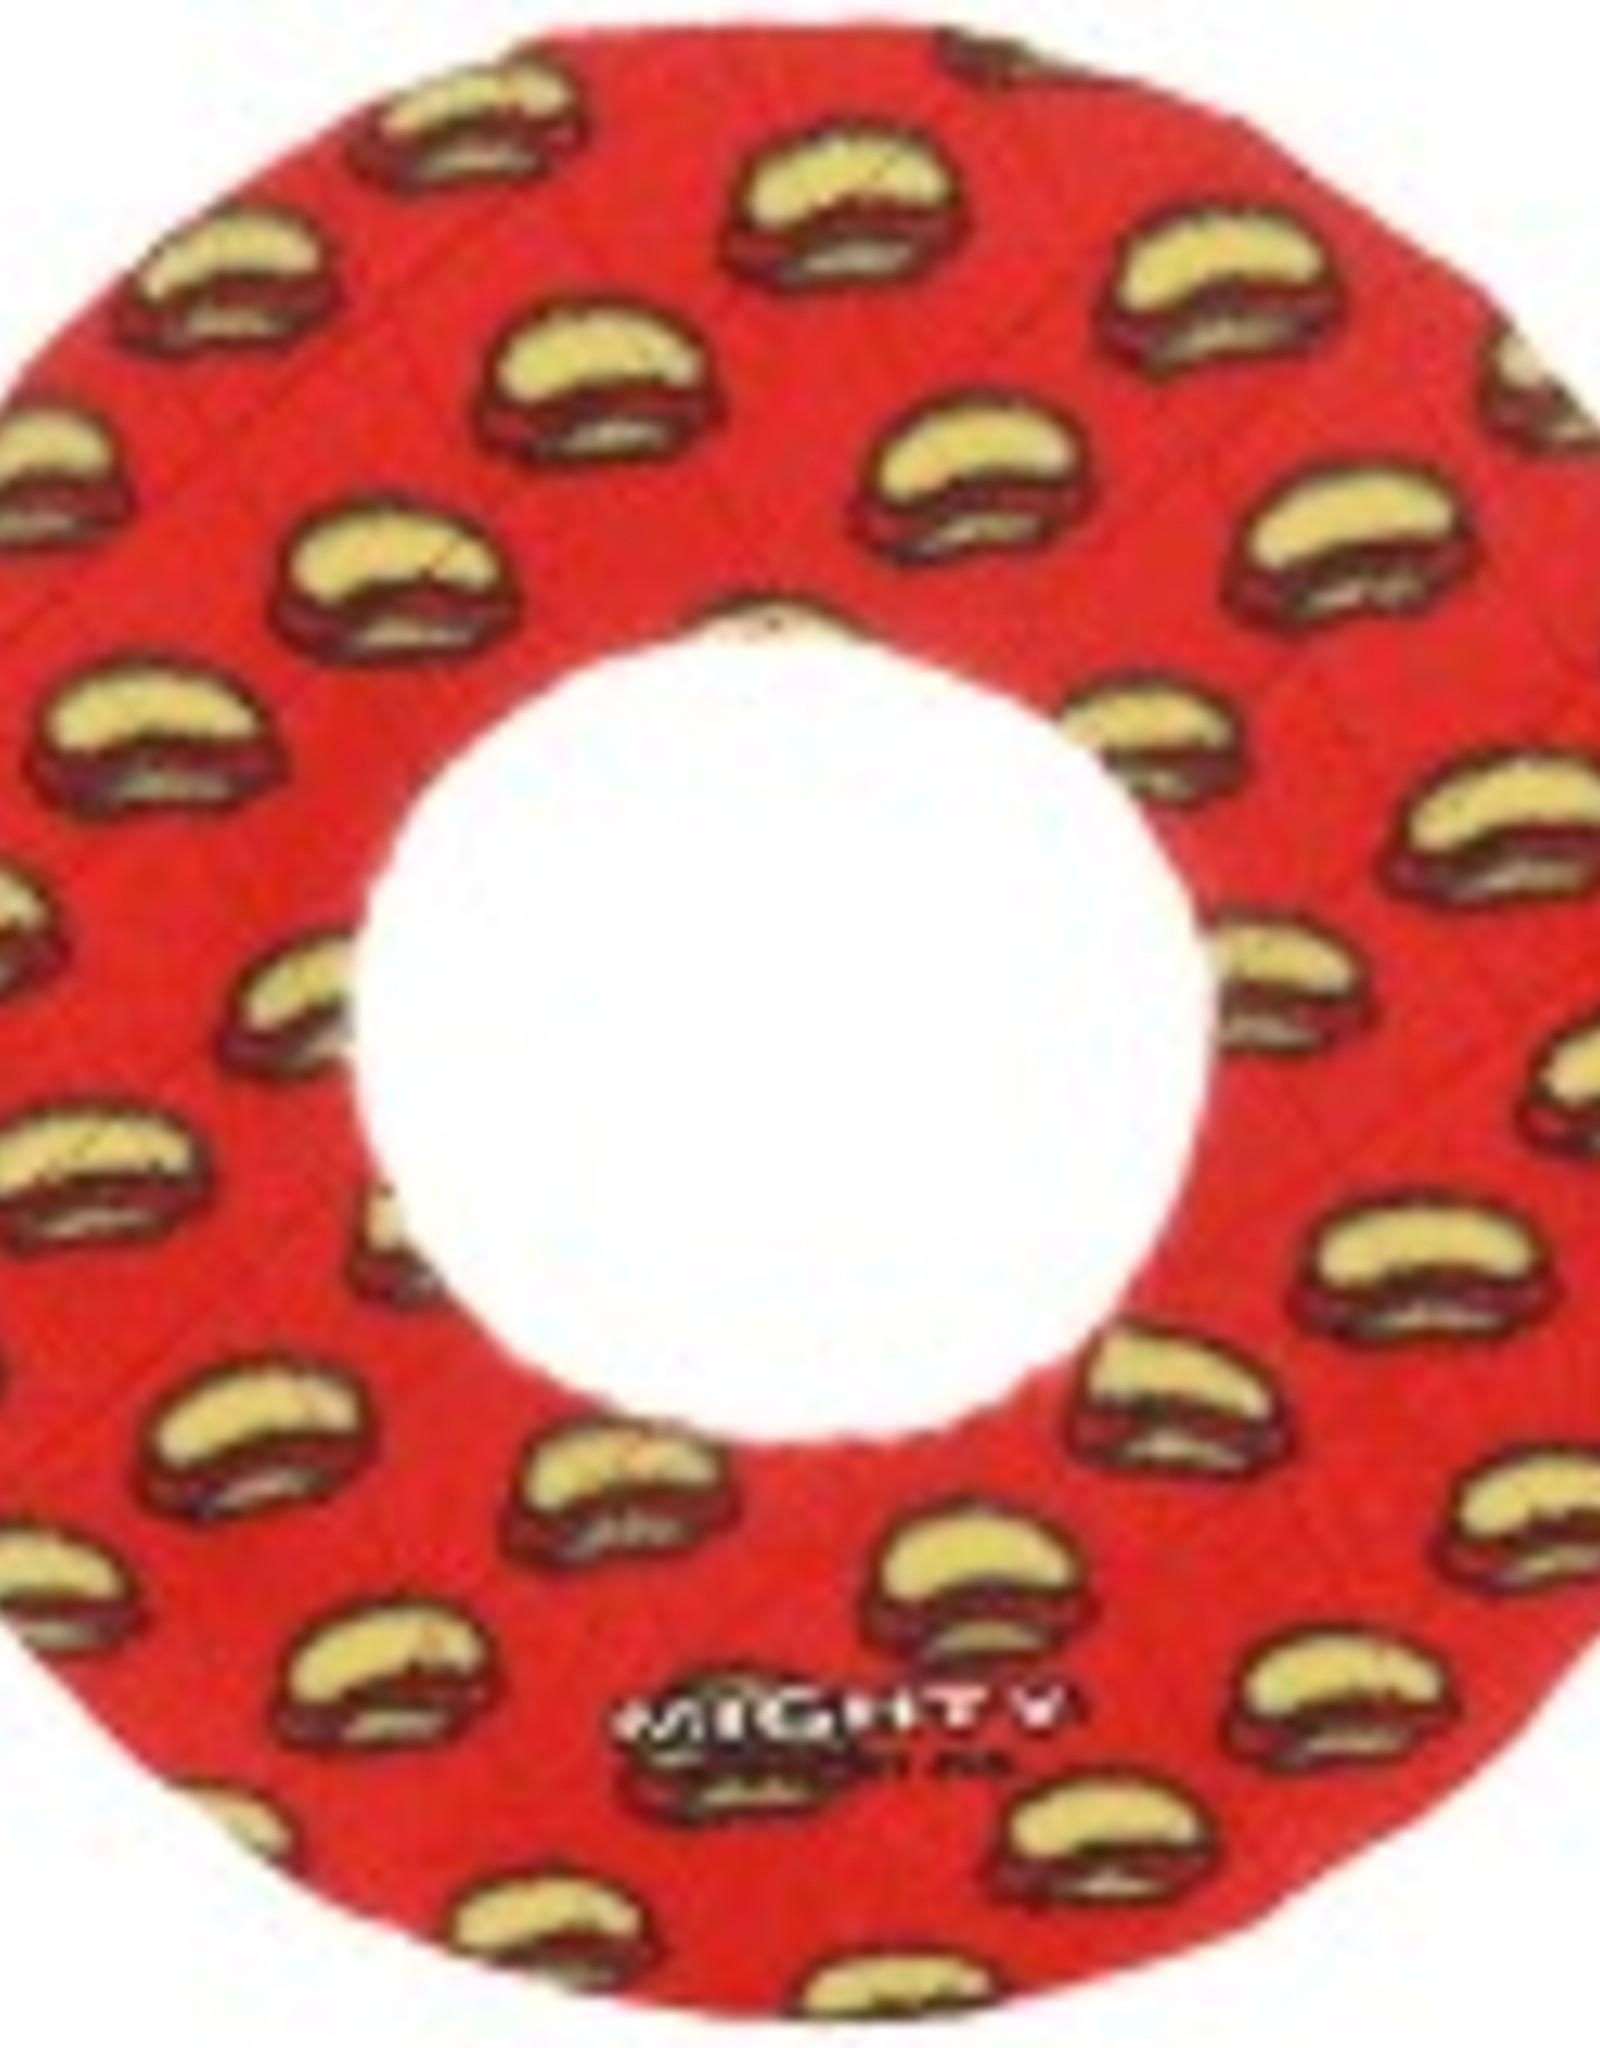 VIP Red Hotdogs Mighty No-Stuff Ring